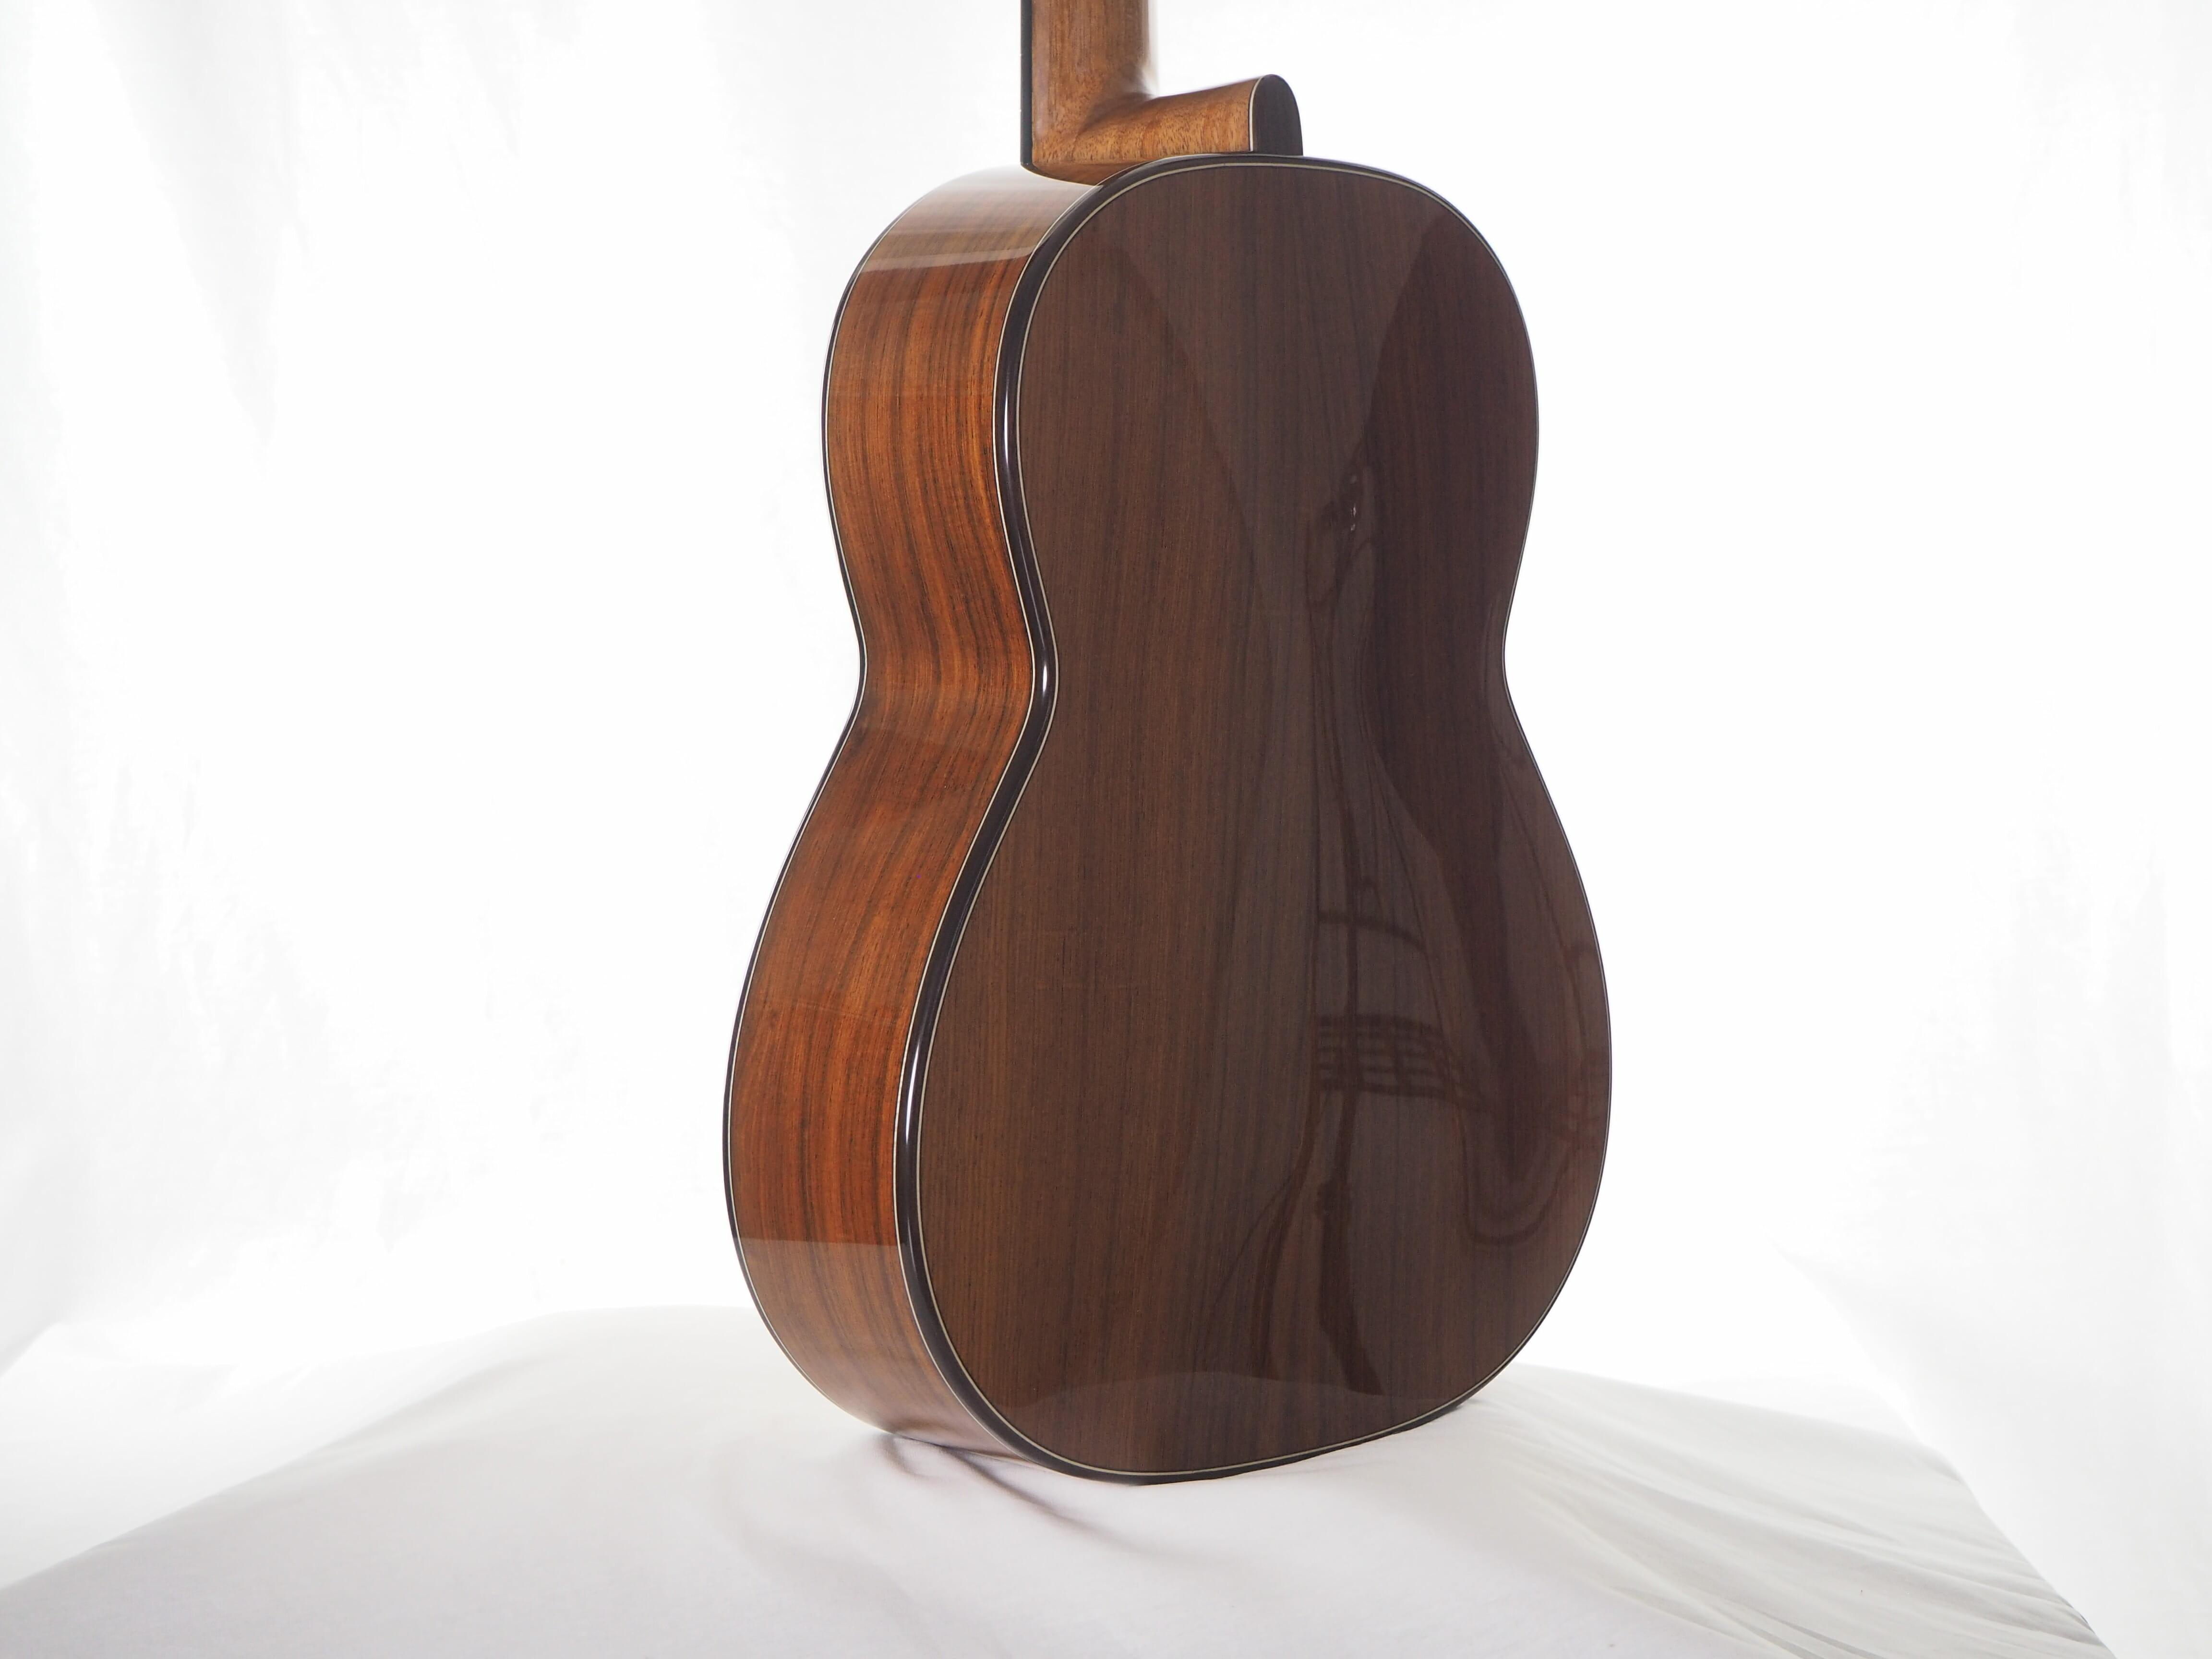 Greg Smallman & sons guitare classique de luthier barrage lattice